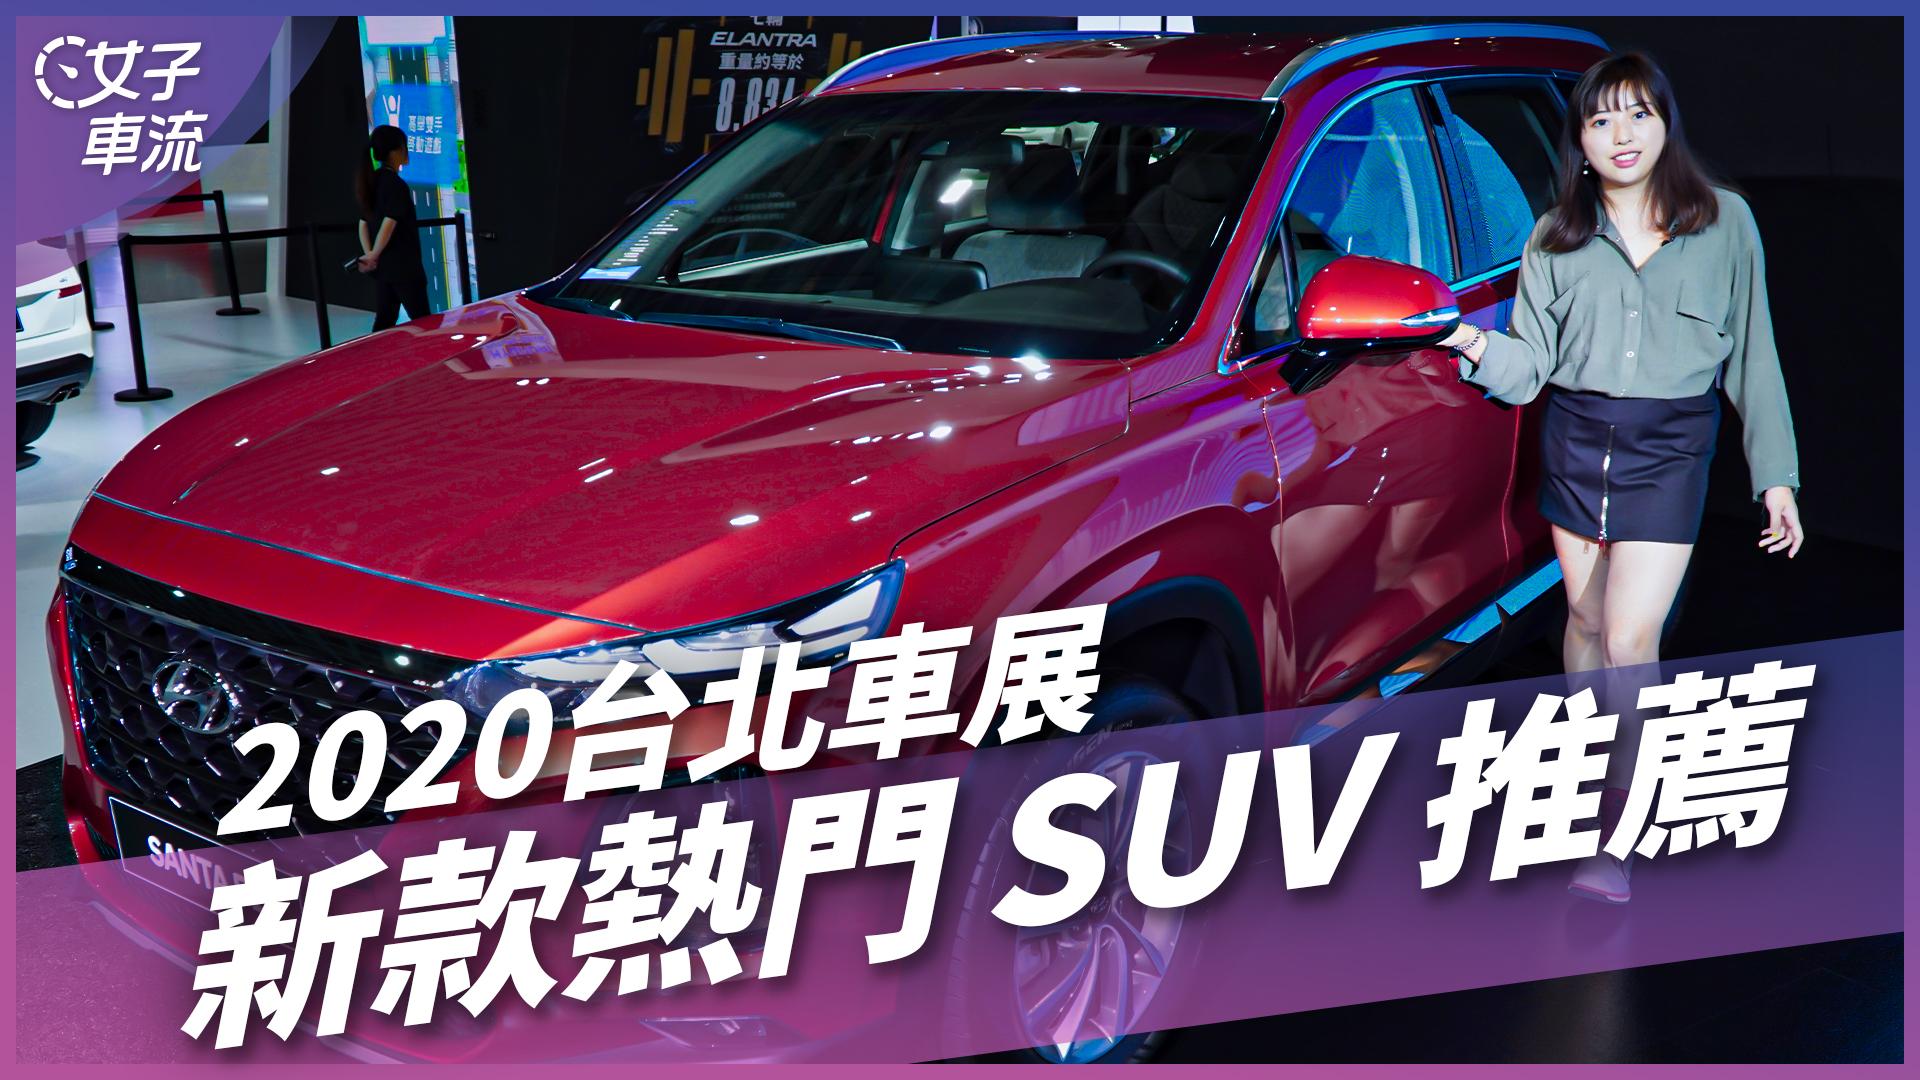 2020 台北車展|新款熱門 SUV 推薦 Toyota RAV4 / Honda CR-V / Benz GLC / BMW X6 / Santa Fe / RX NX / Q8 / Kodiaq